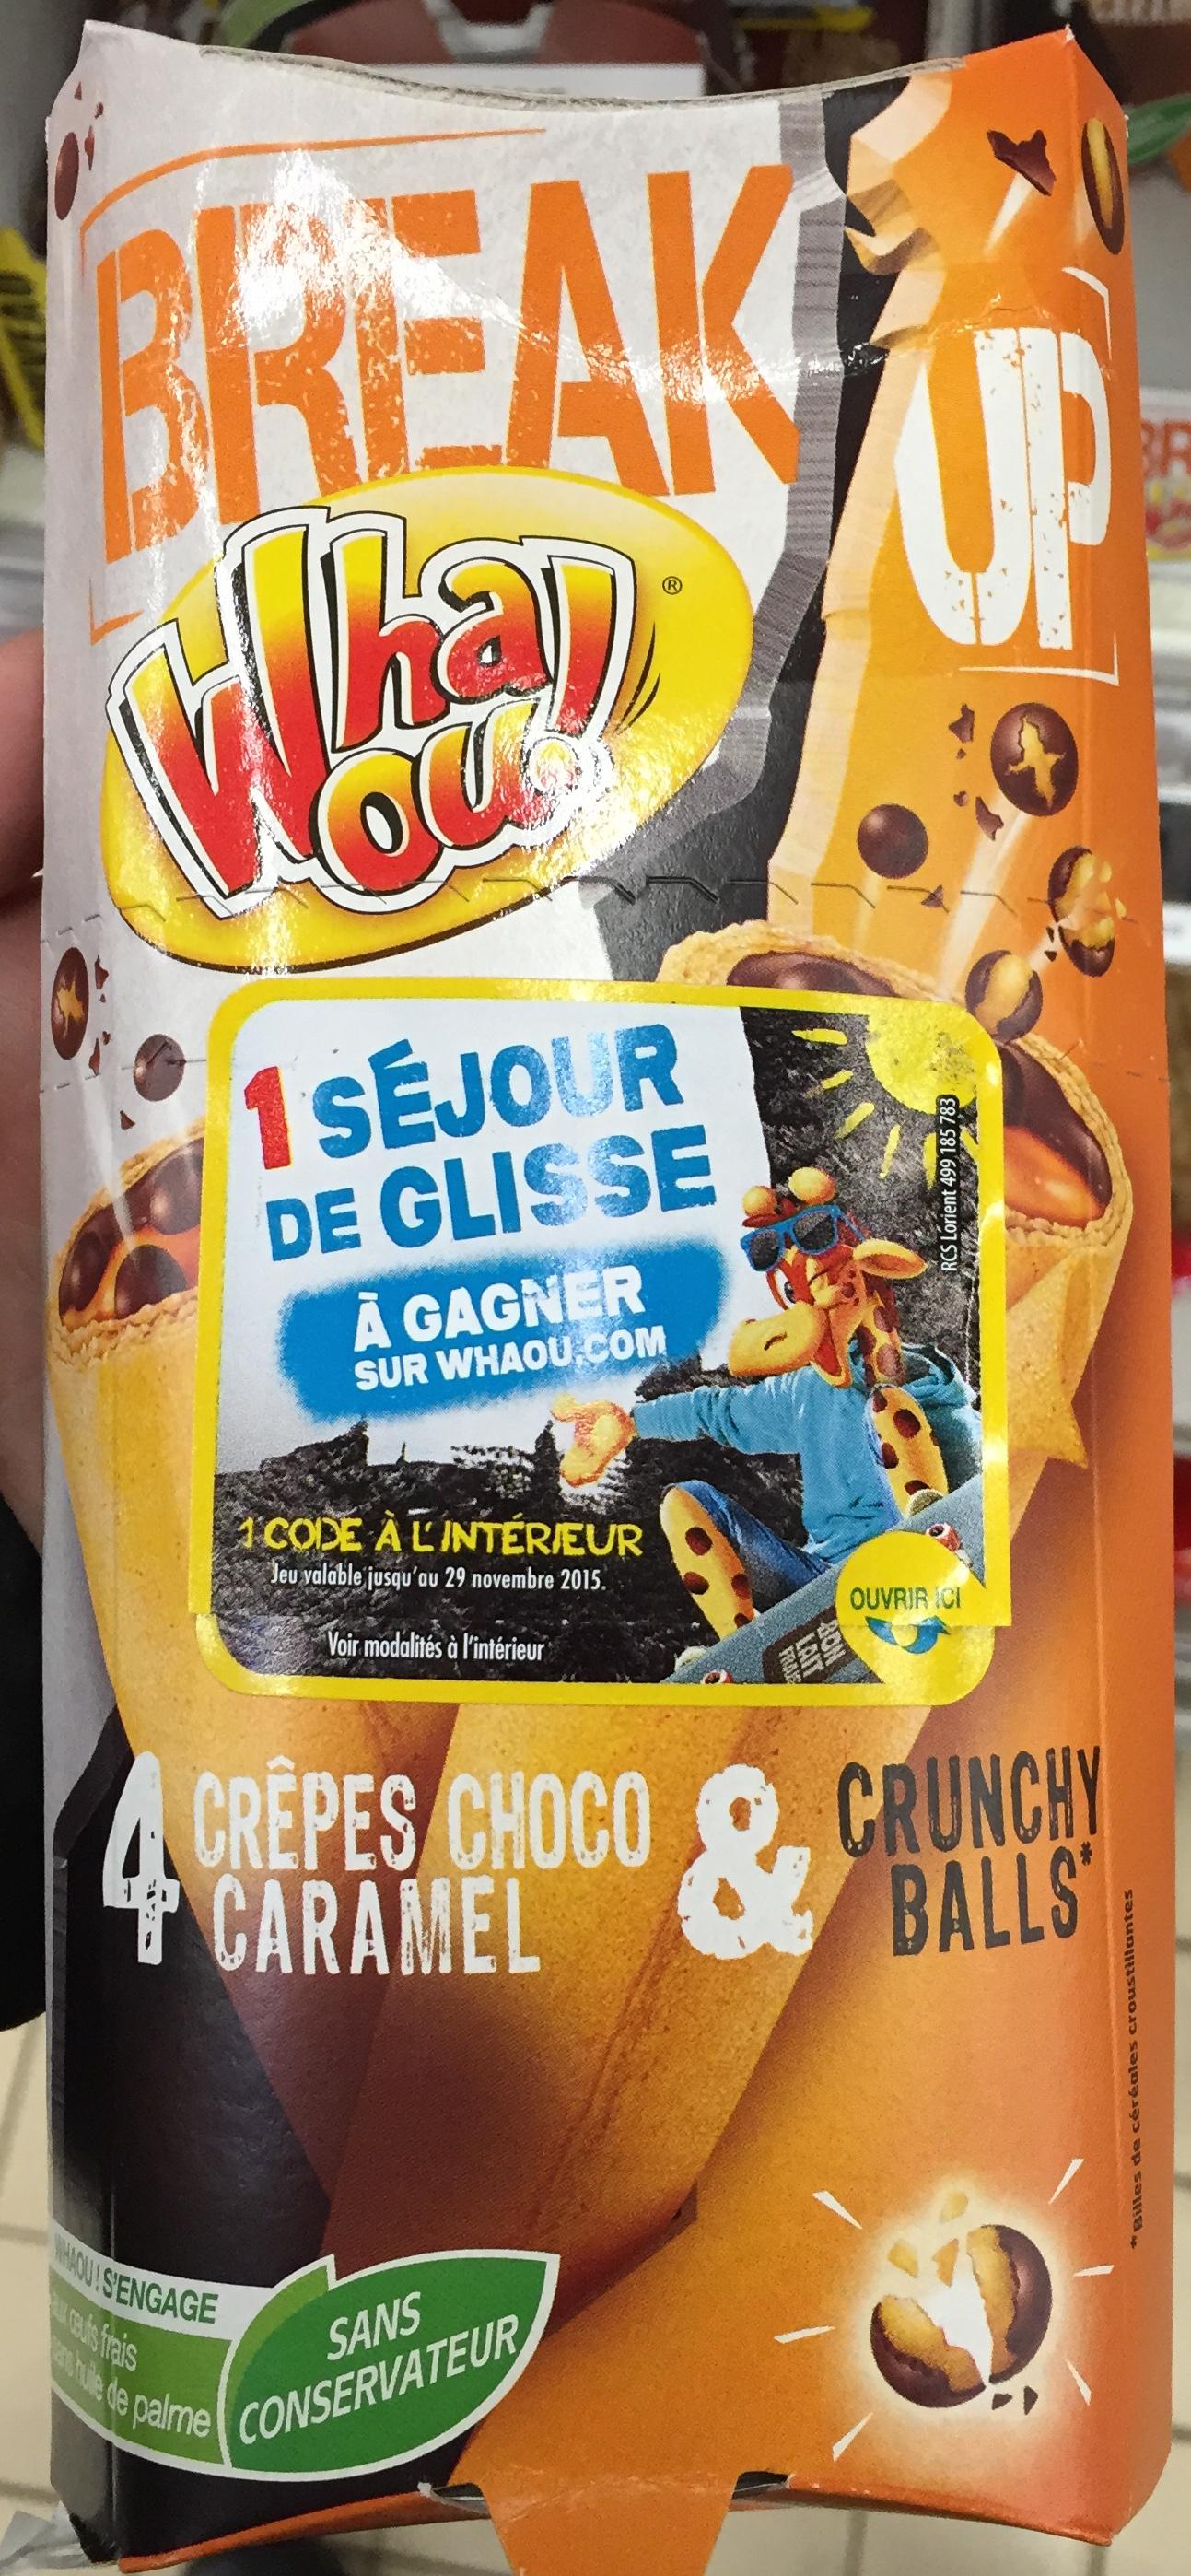 Break Up 4 crêpes Choco Caramel & Crunchy Balls - Product